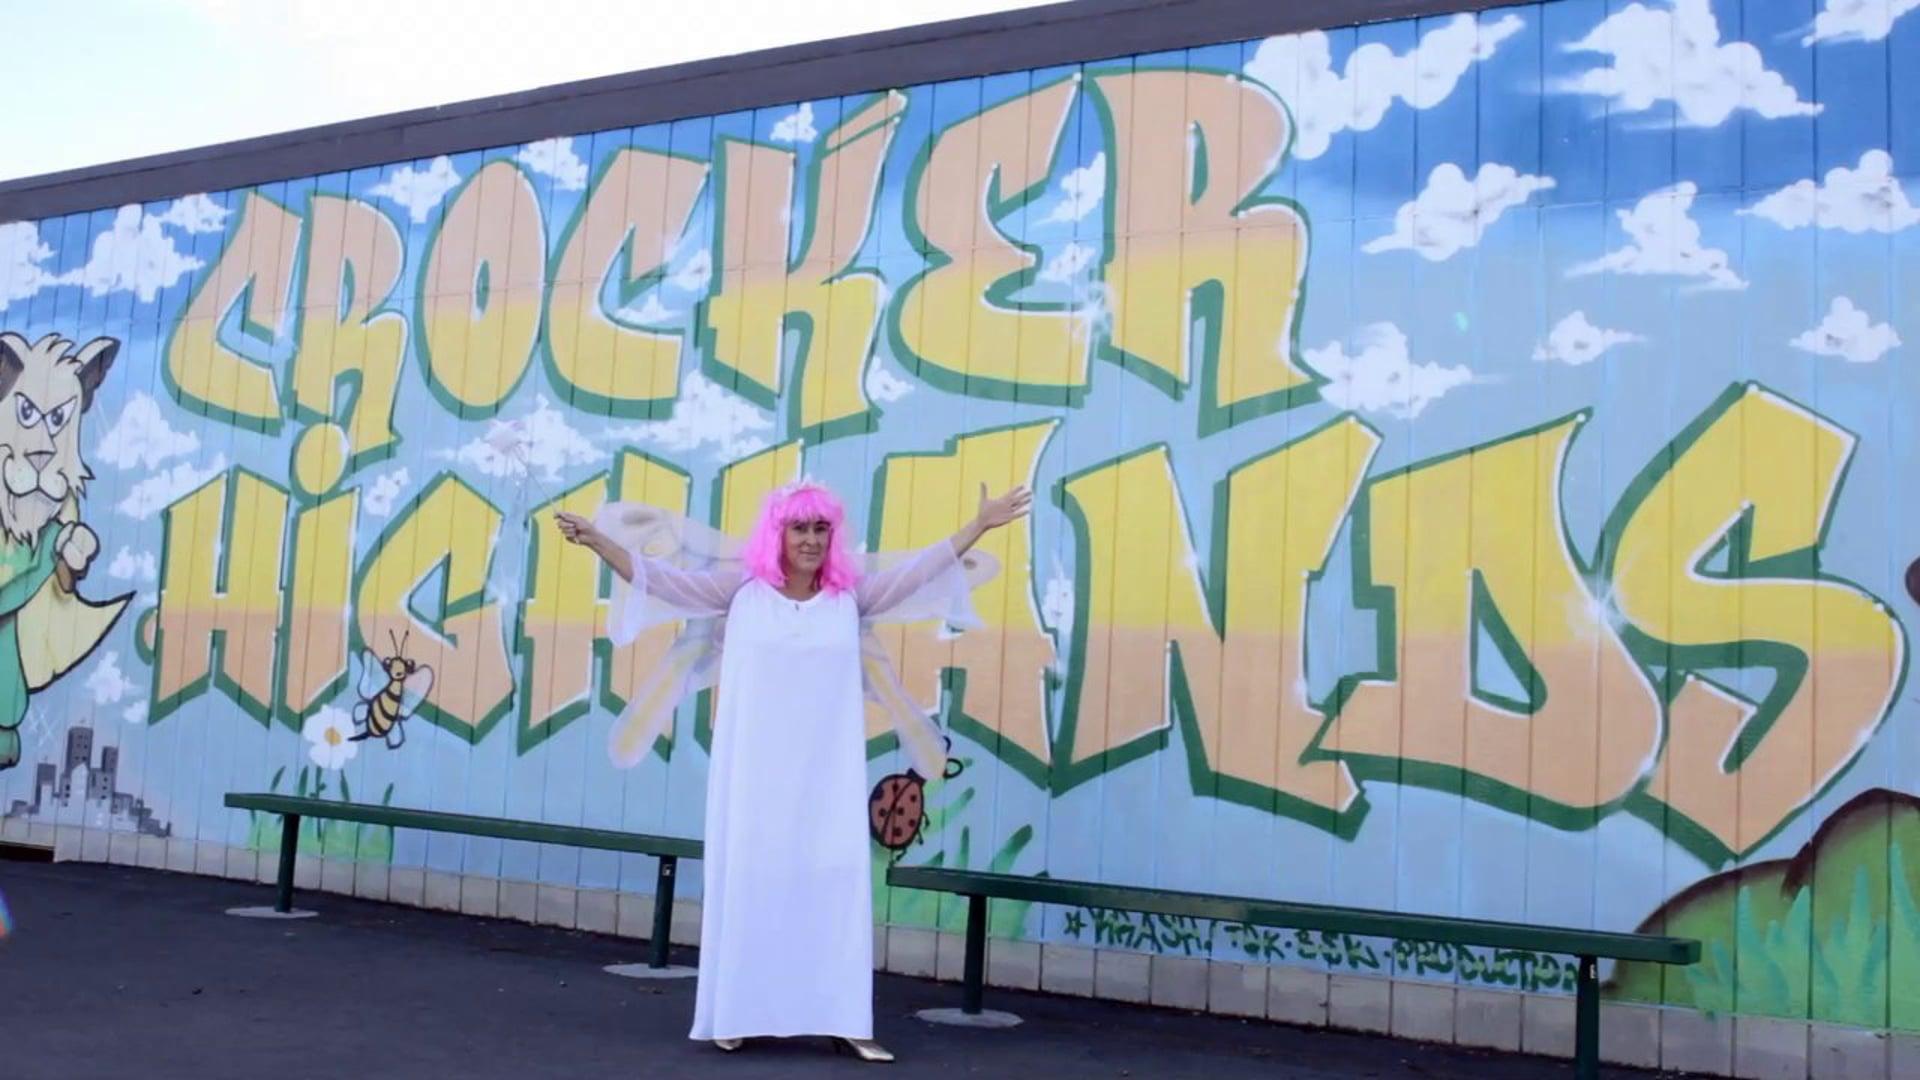 Crocker Highlands Elementary School: The Funding Fairy